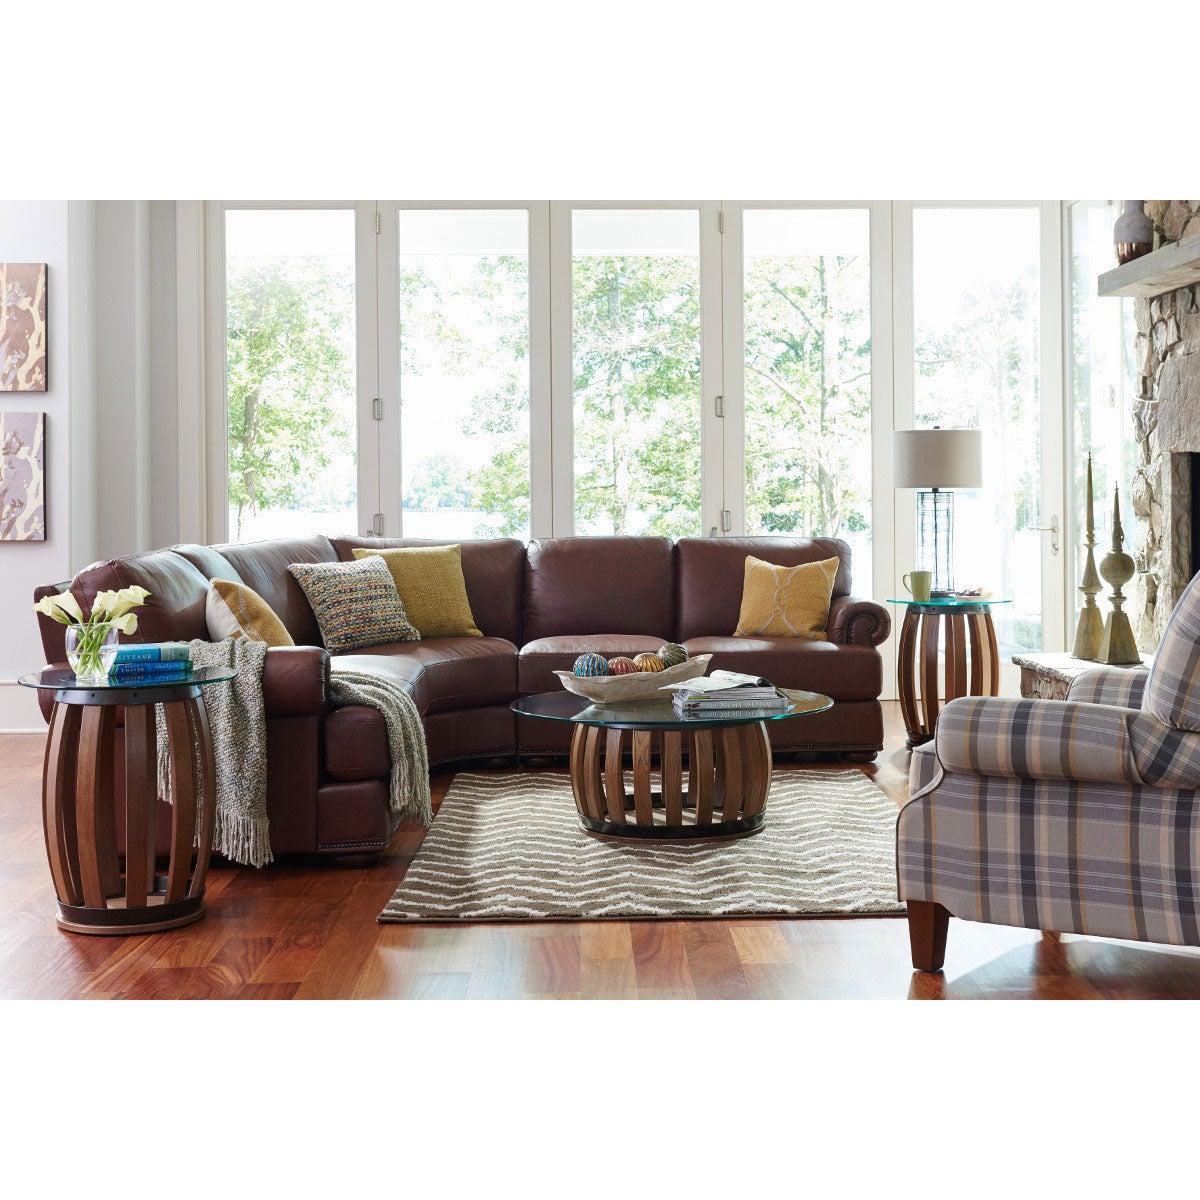 Lazy Boy Sale Ottawa 100 Lazy Boy Furniture Sofas Please Help With My La Z Boy D Detroit Area